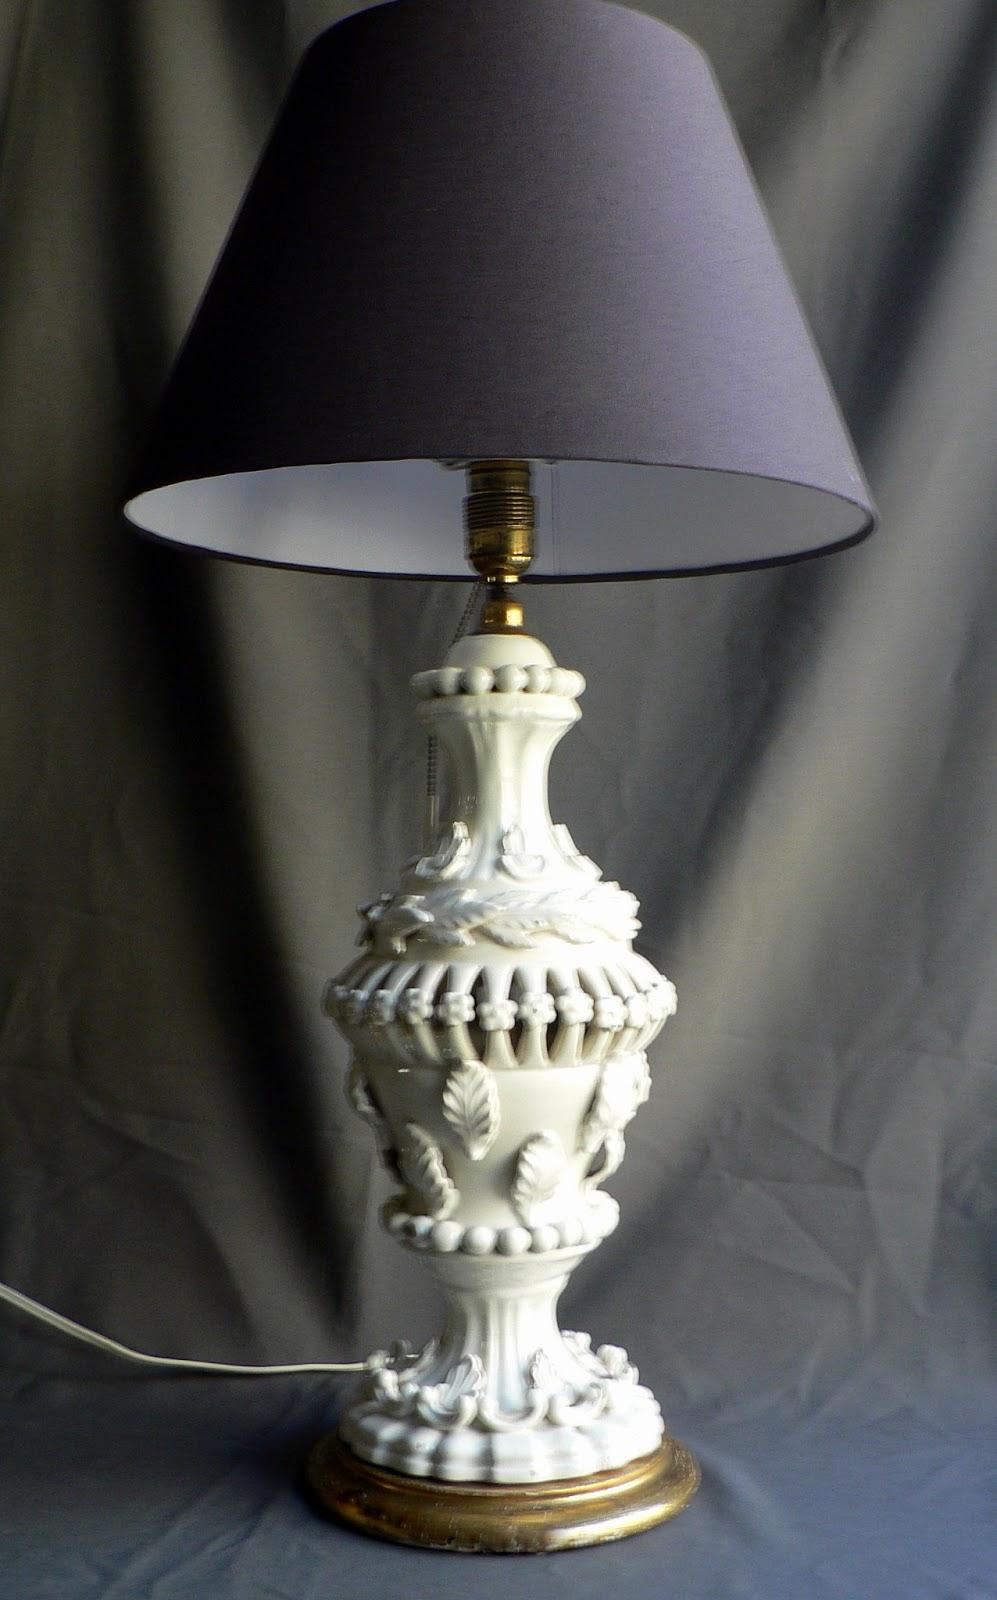 Vintage kitsch siglo xx lampara de cer mica de manises - Lamparas de ceramica ...